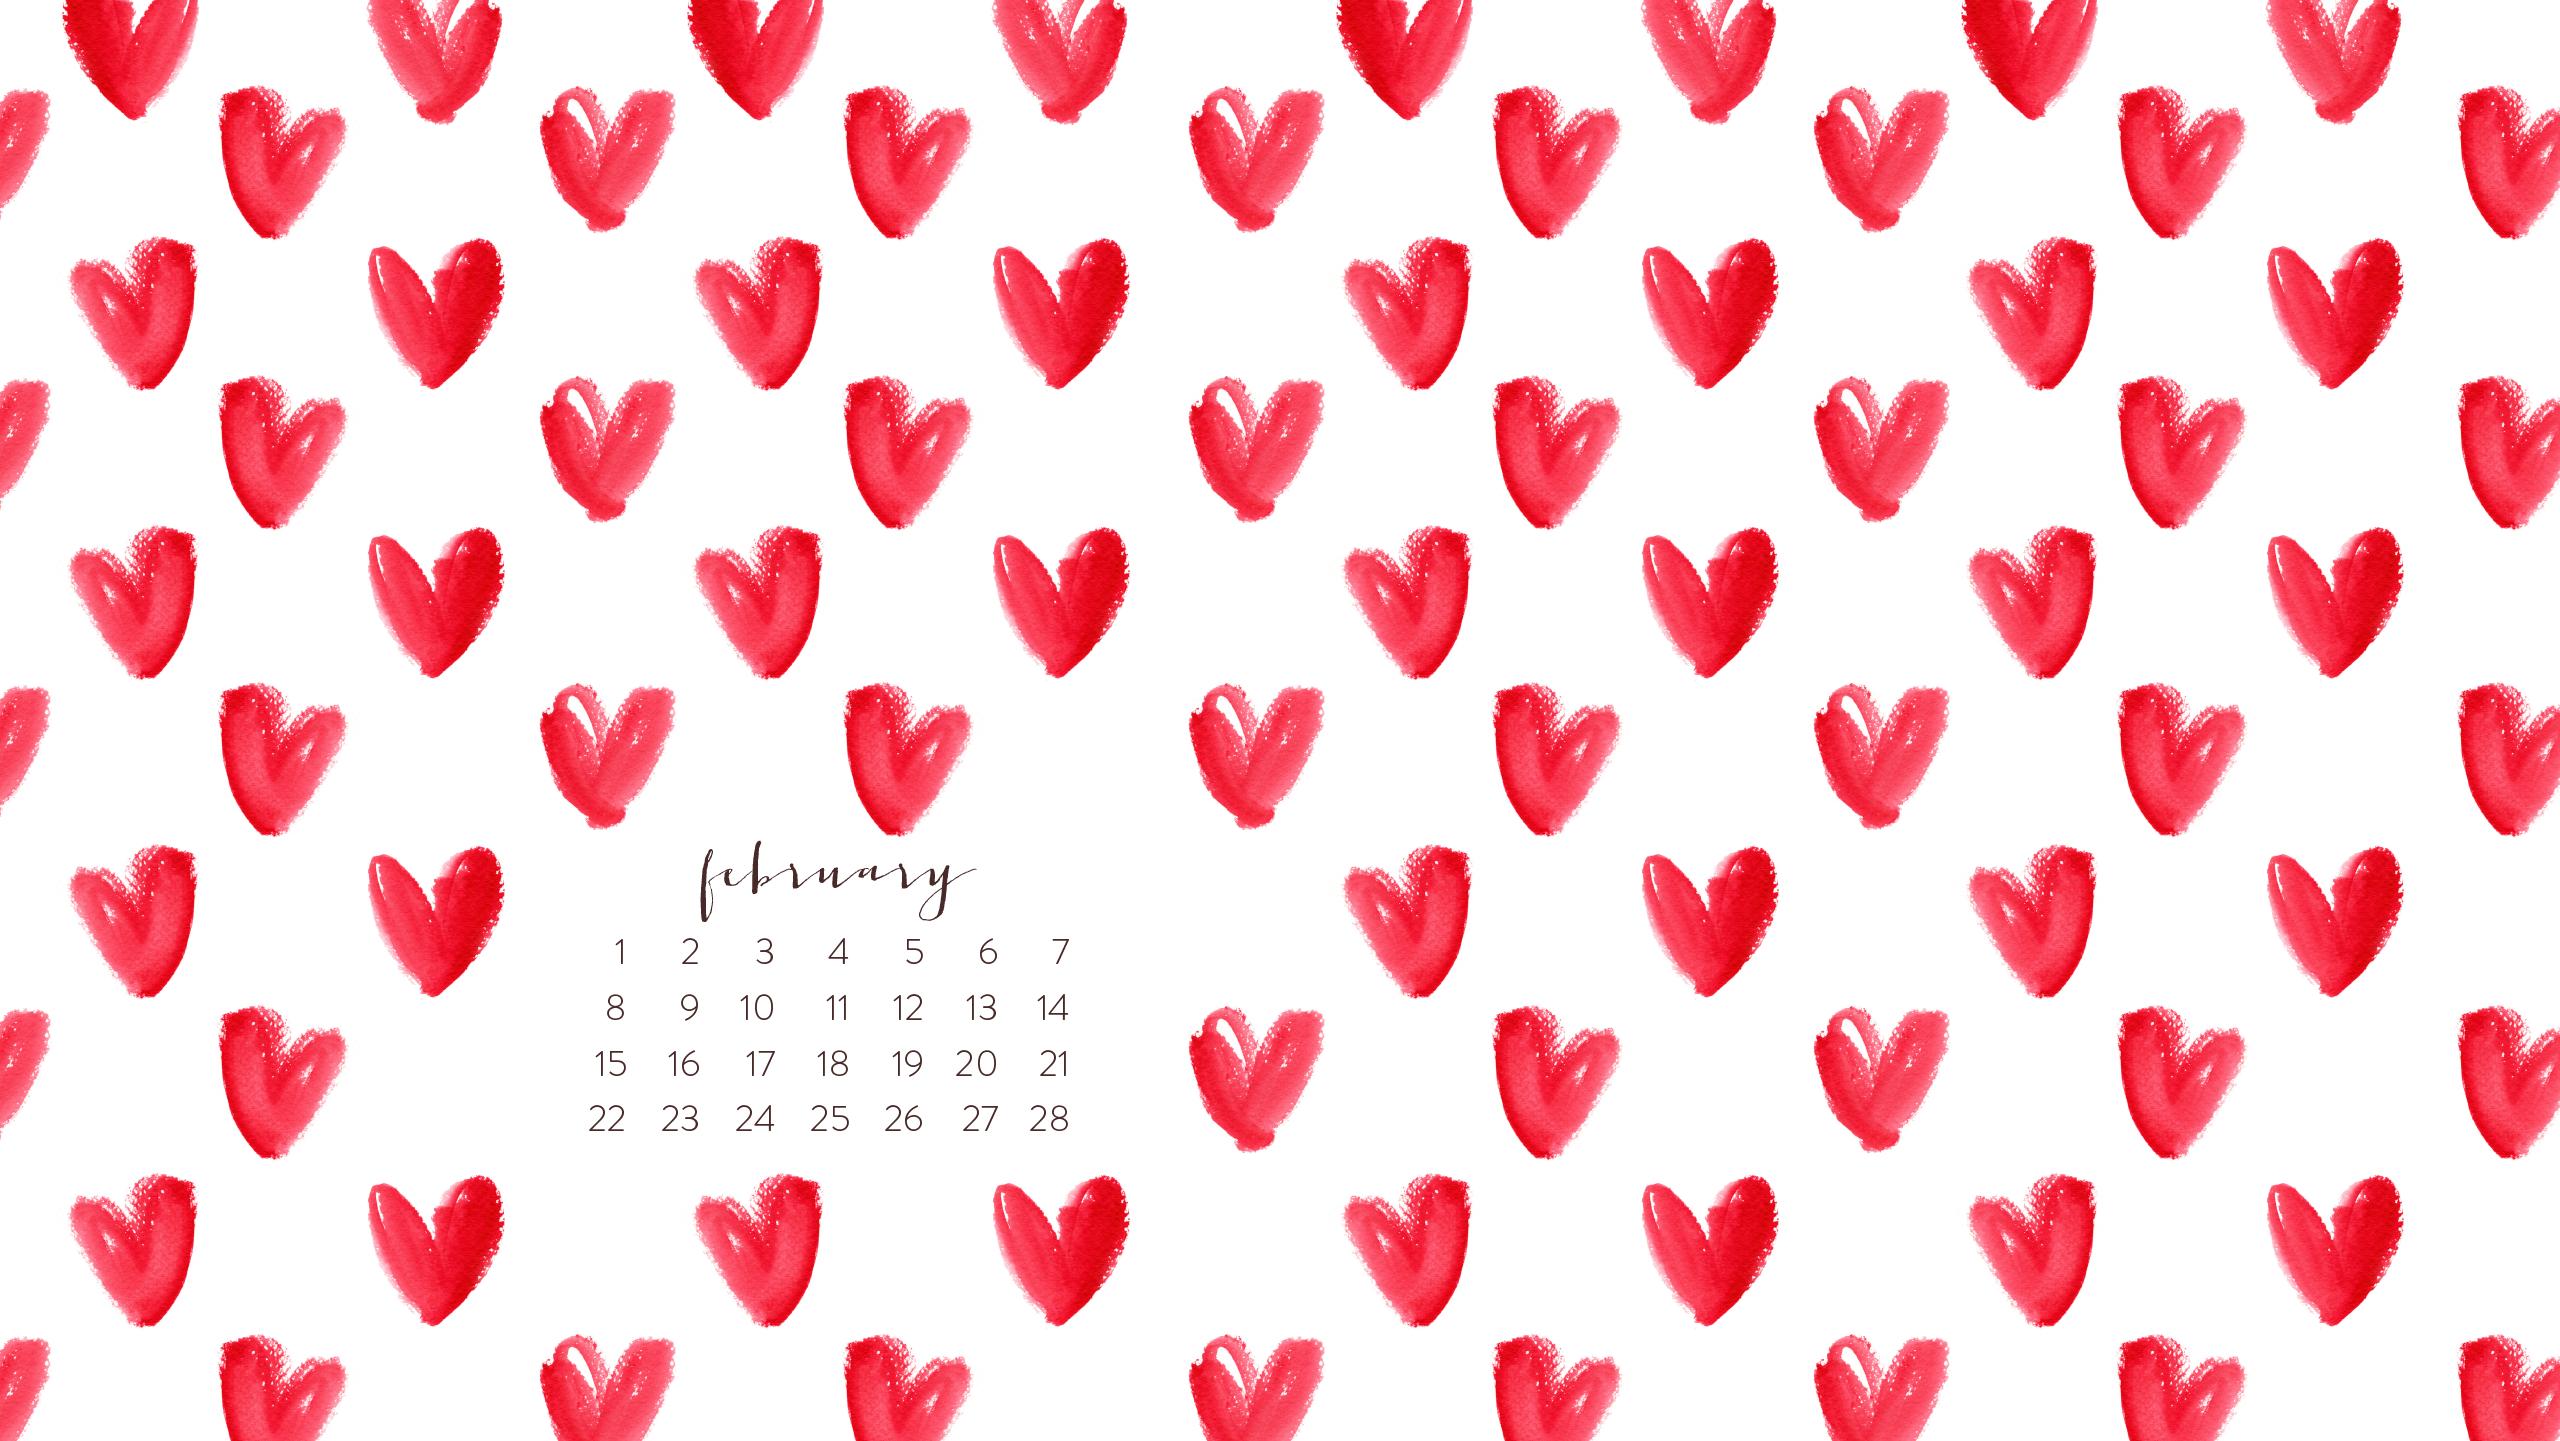 February Wallpaper Nicolesclasses 02 2560x1441